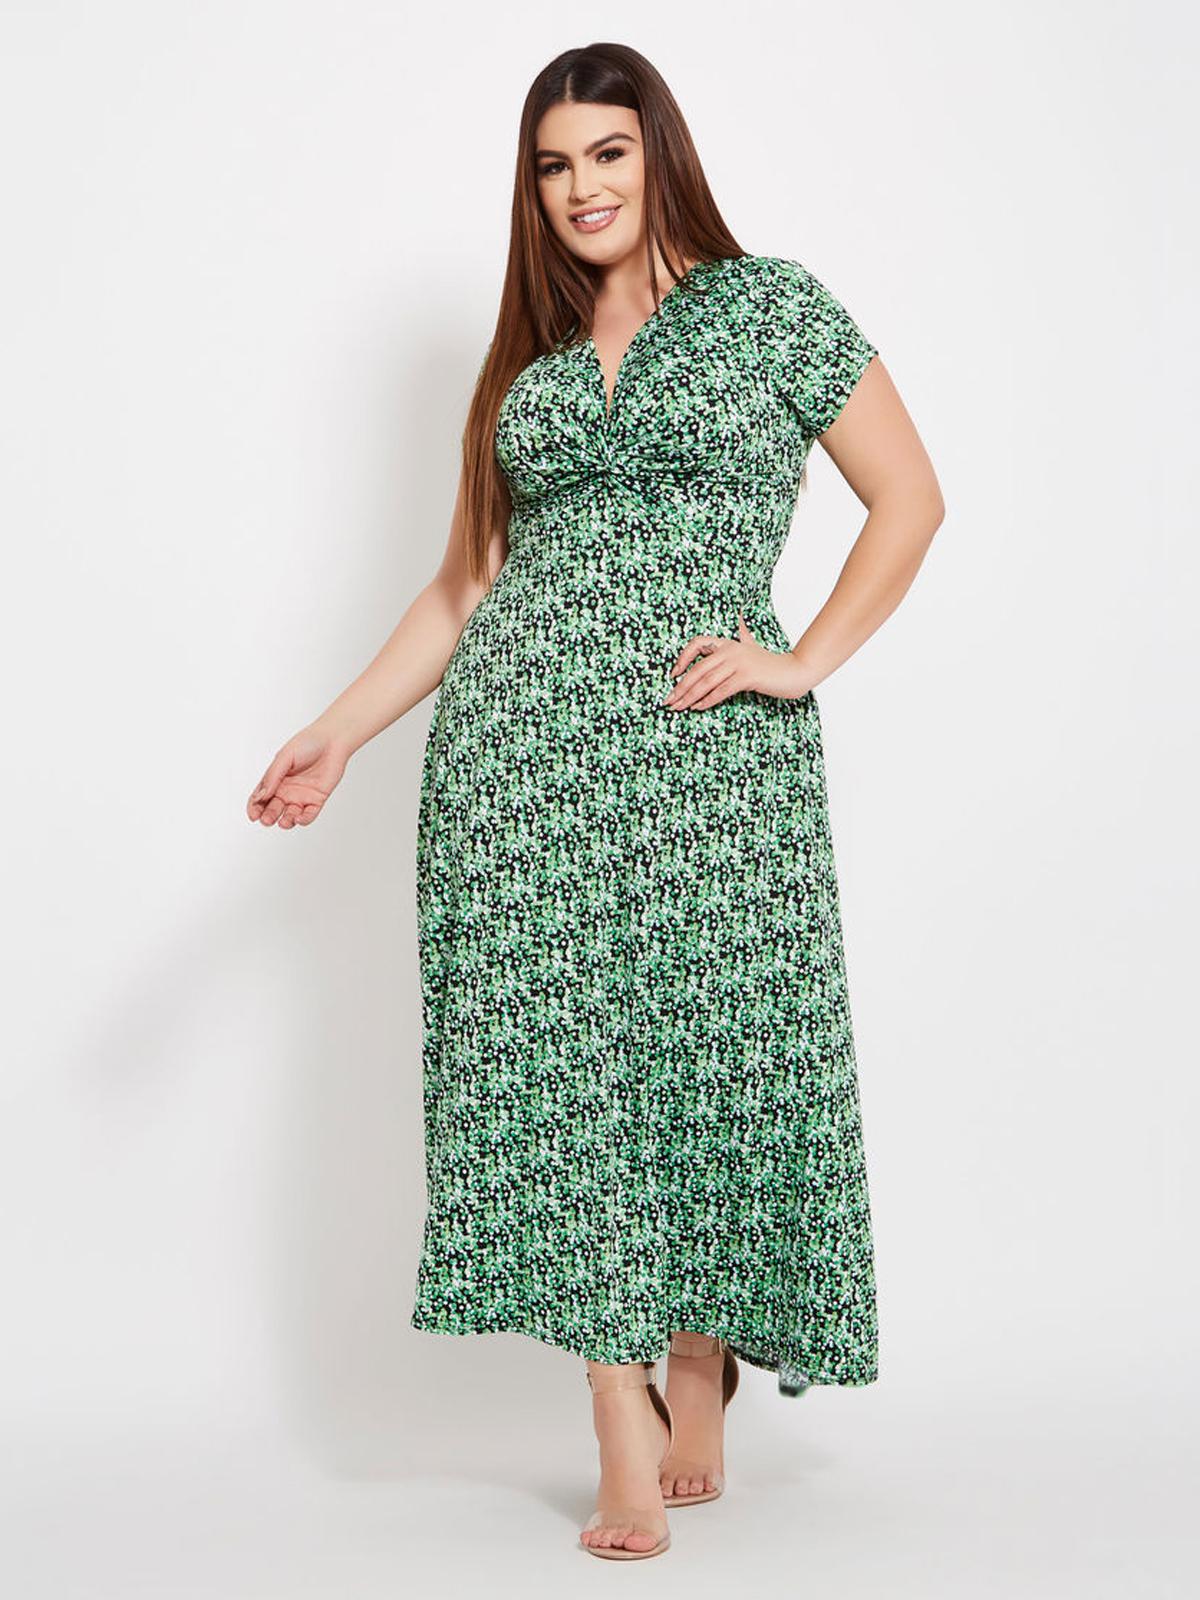 curvy-con-dress-20.jpg